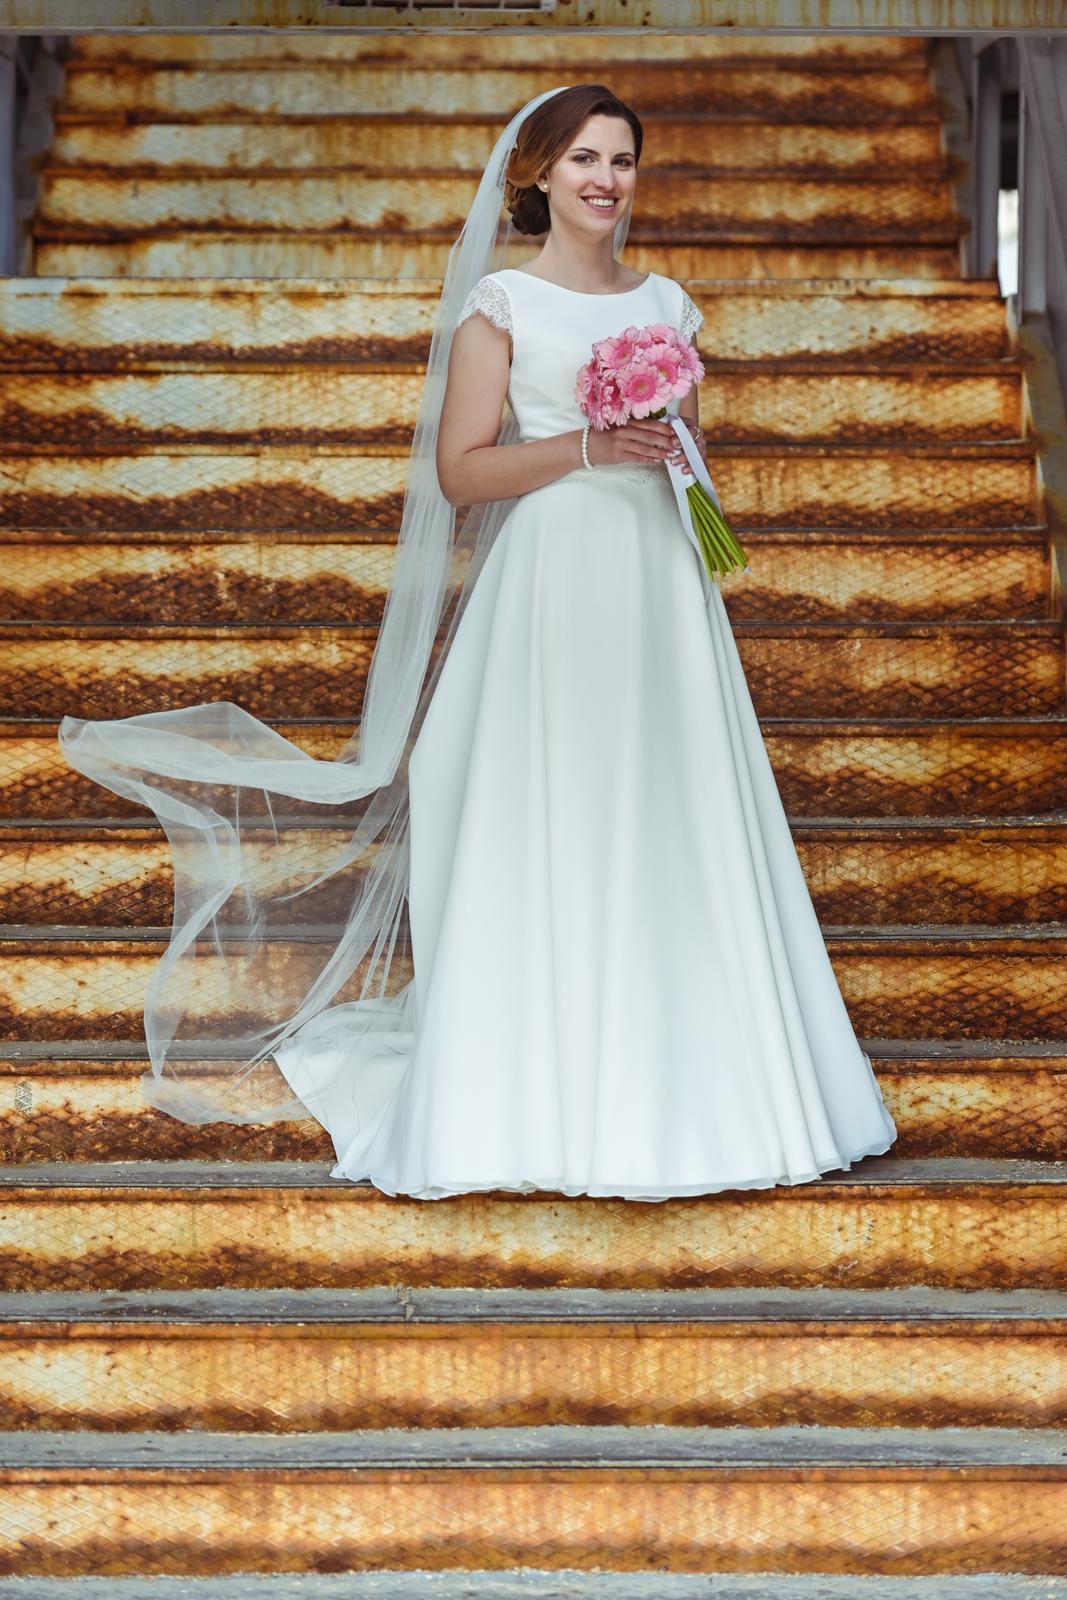 Jednoduché svadobné šaty Ivory- menší kruh, závoj - Obrázok č. 1